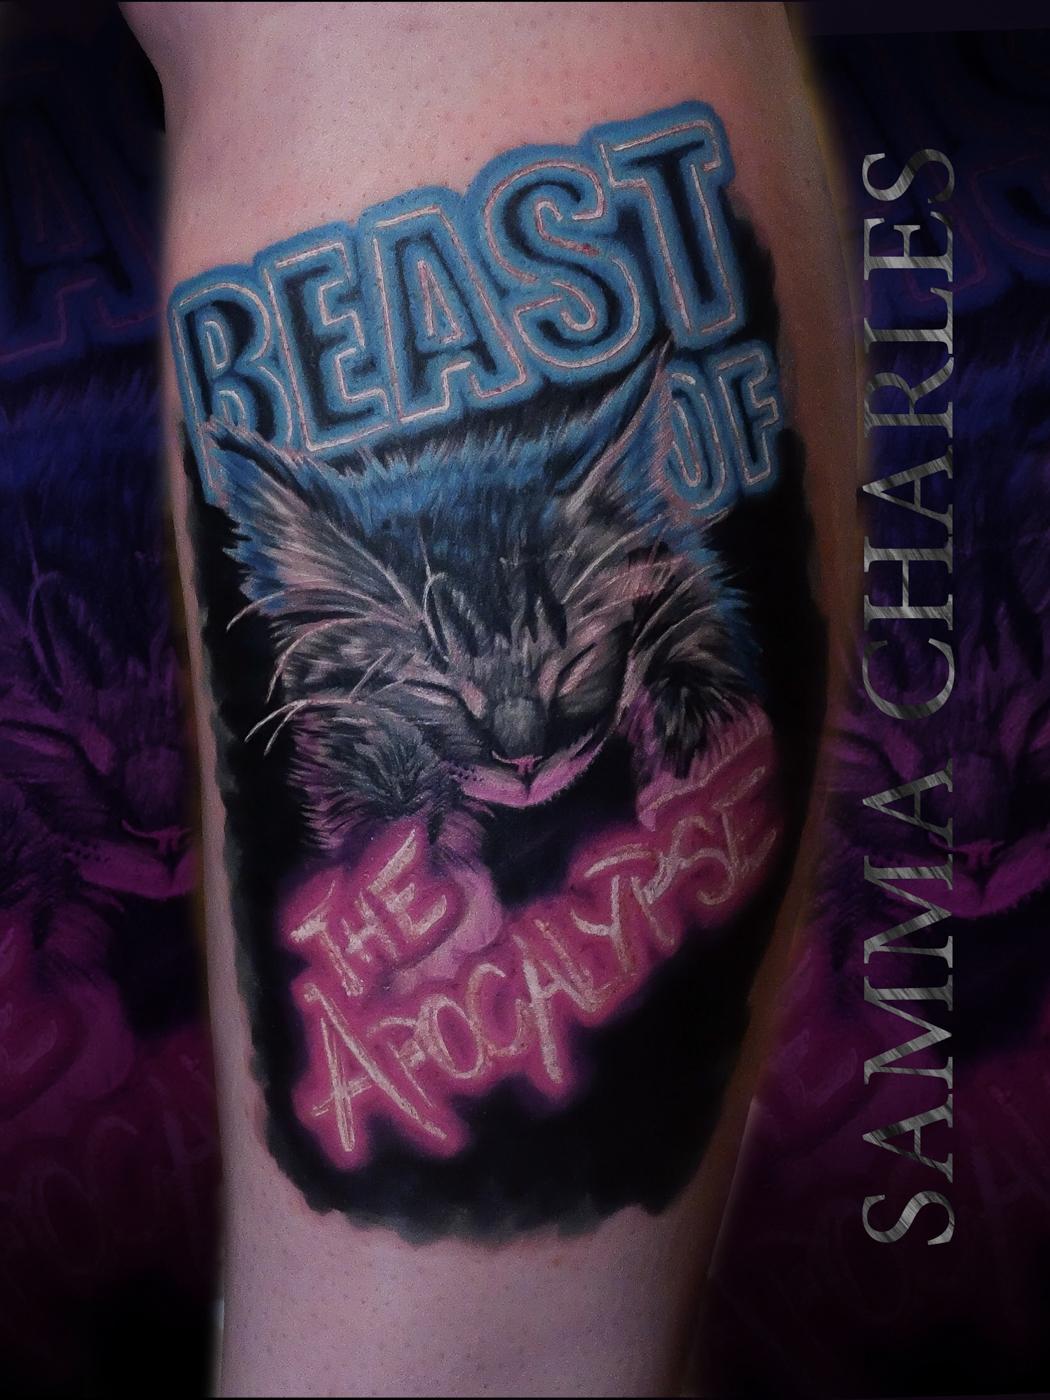 oxfordshire-tattoo-studio-47.jpg